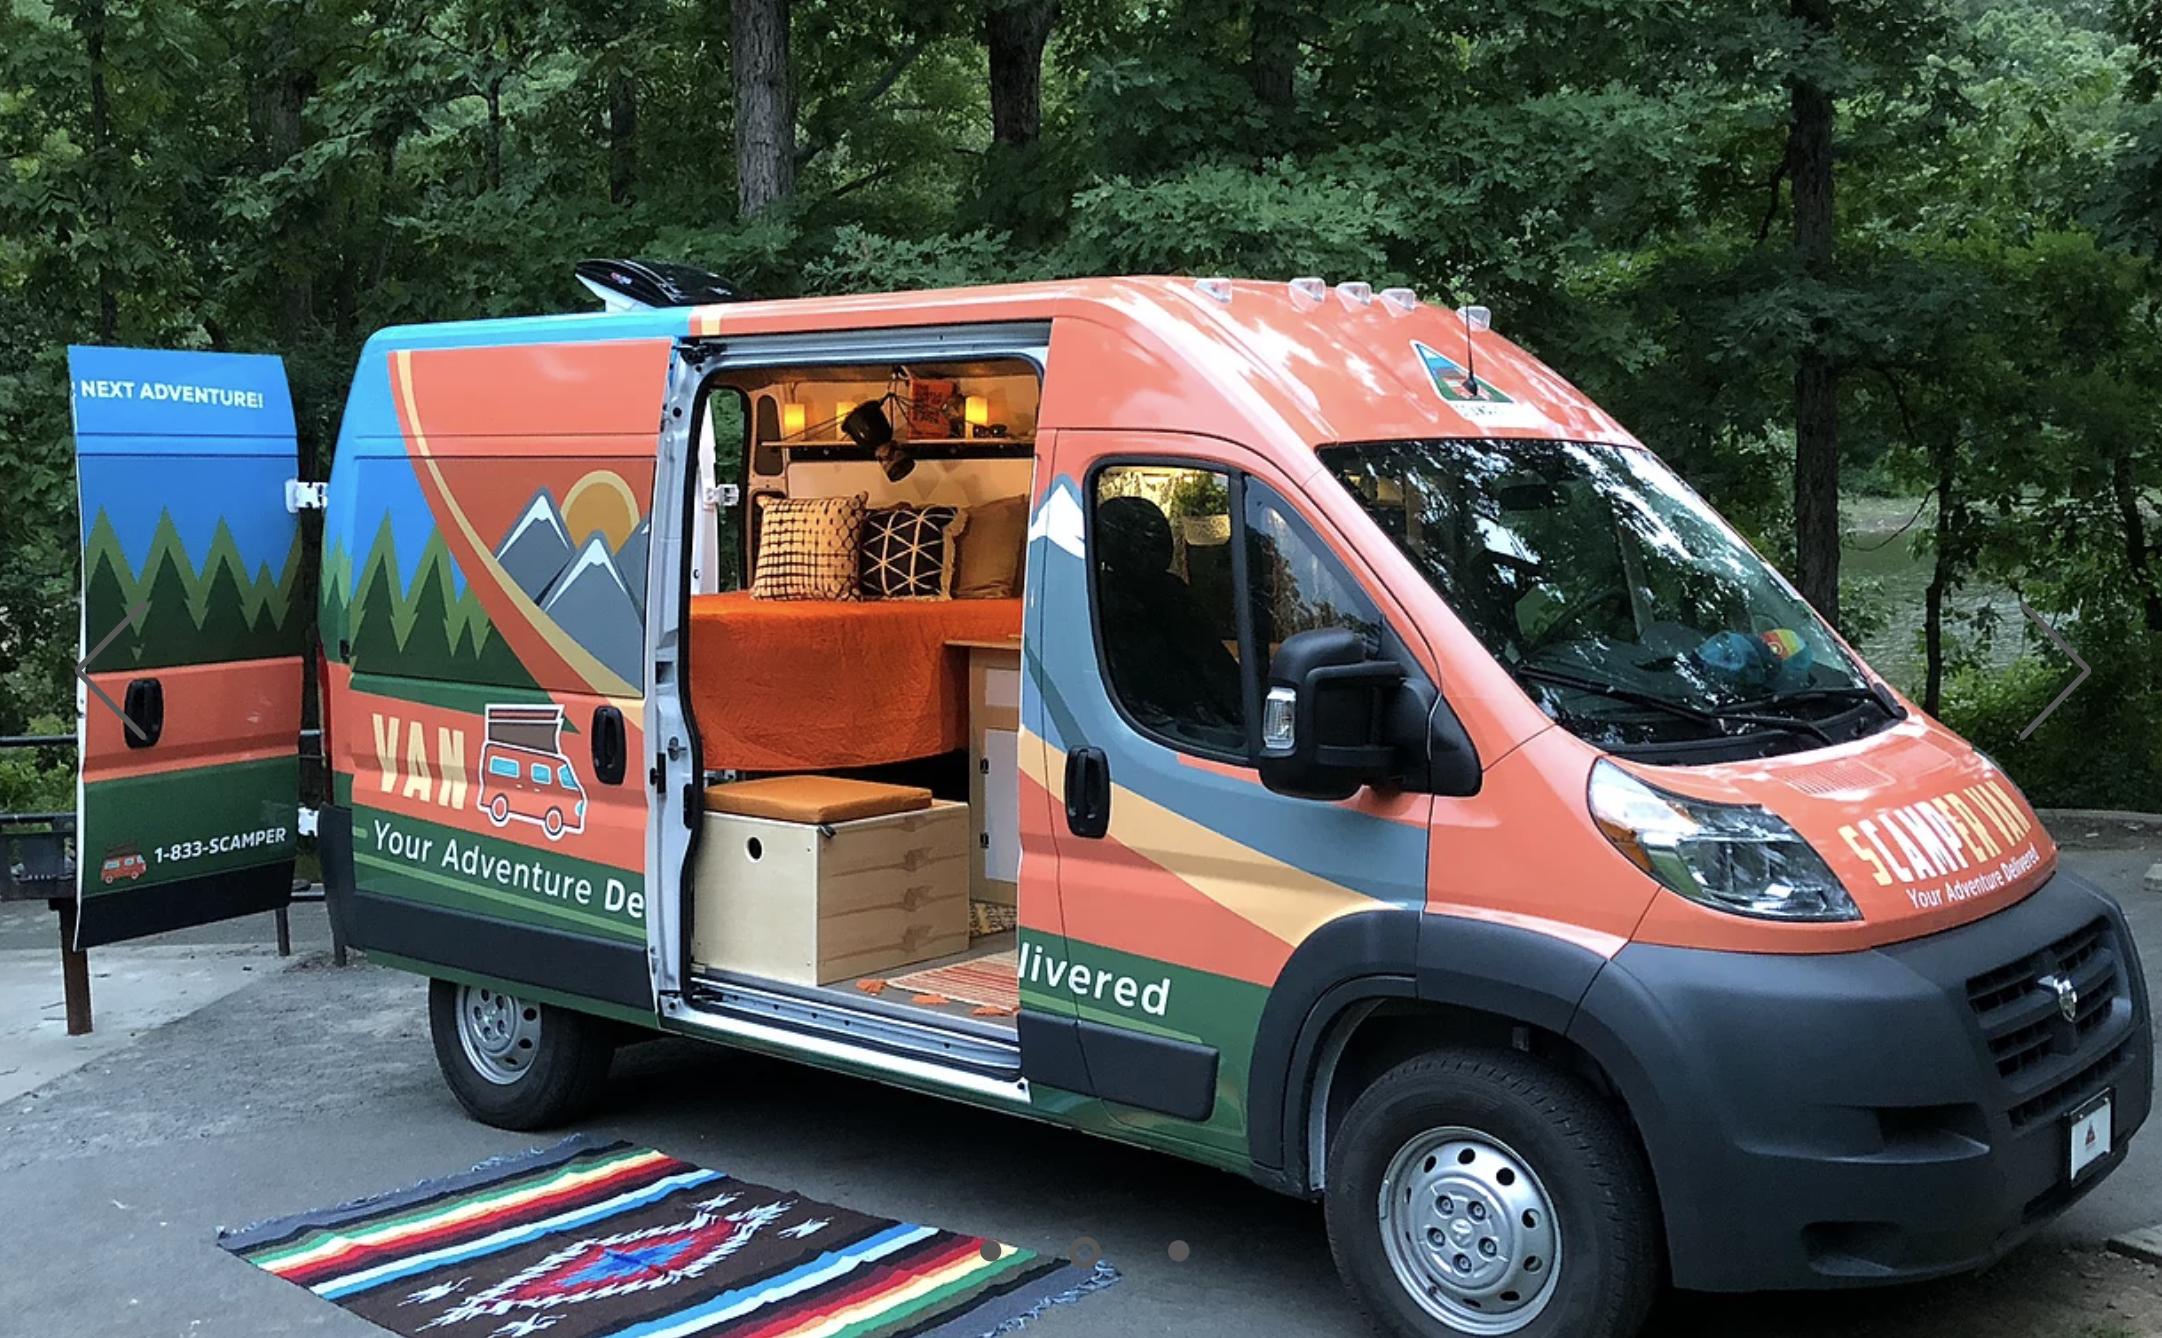 Episode 83: David Clapper – CEO of sCAMPer Van